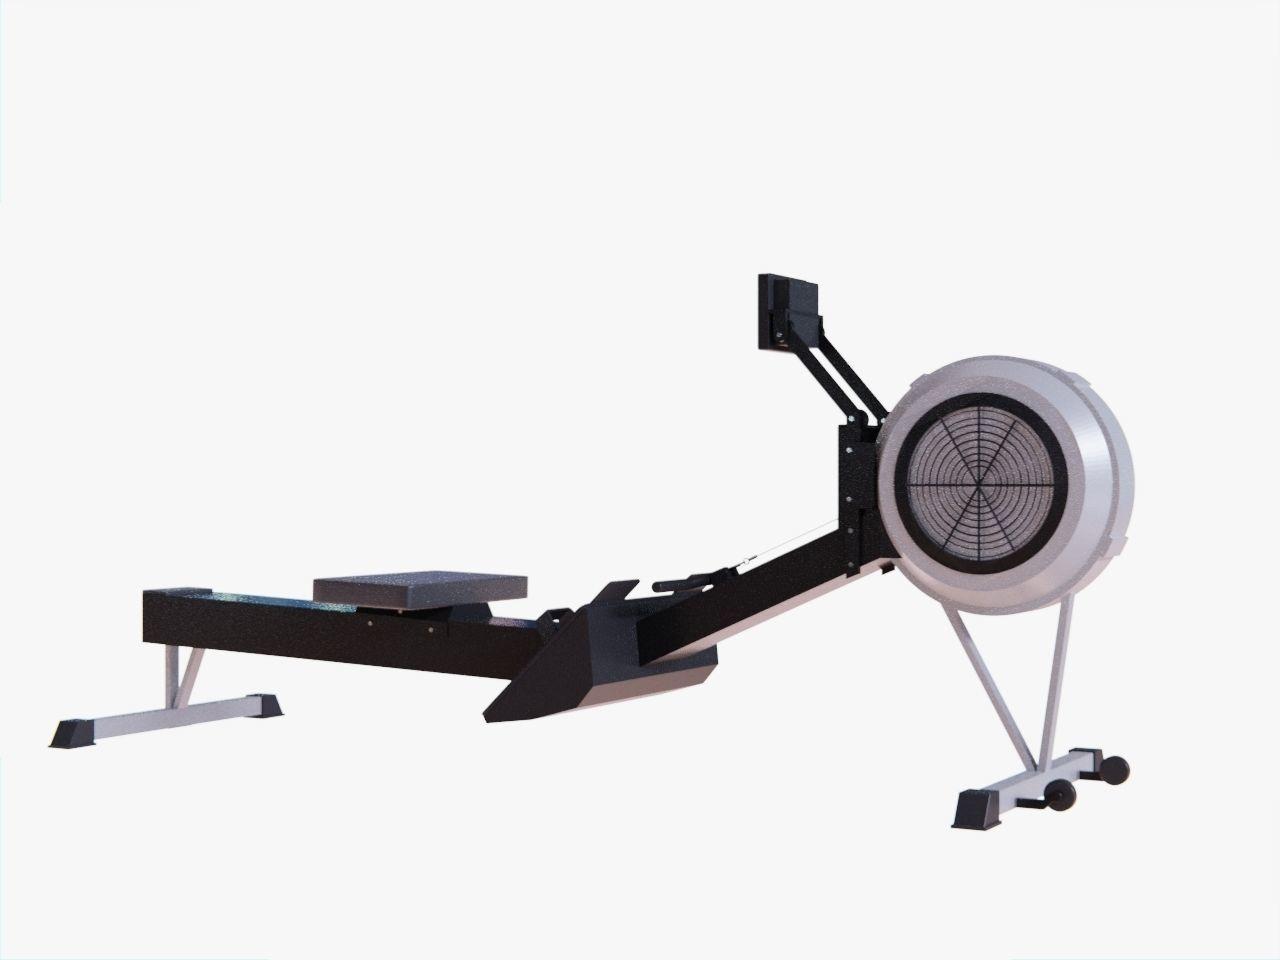 Rowing Machine - Indoor Rower - Gym Equipment